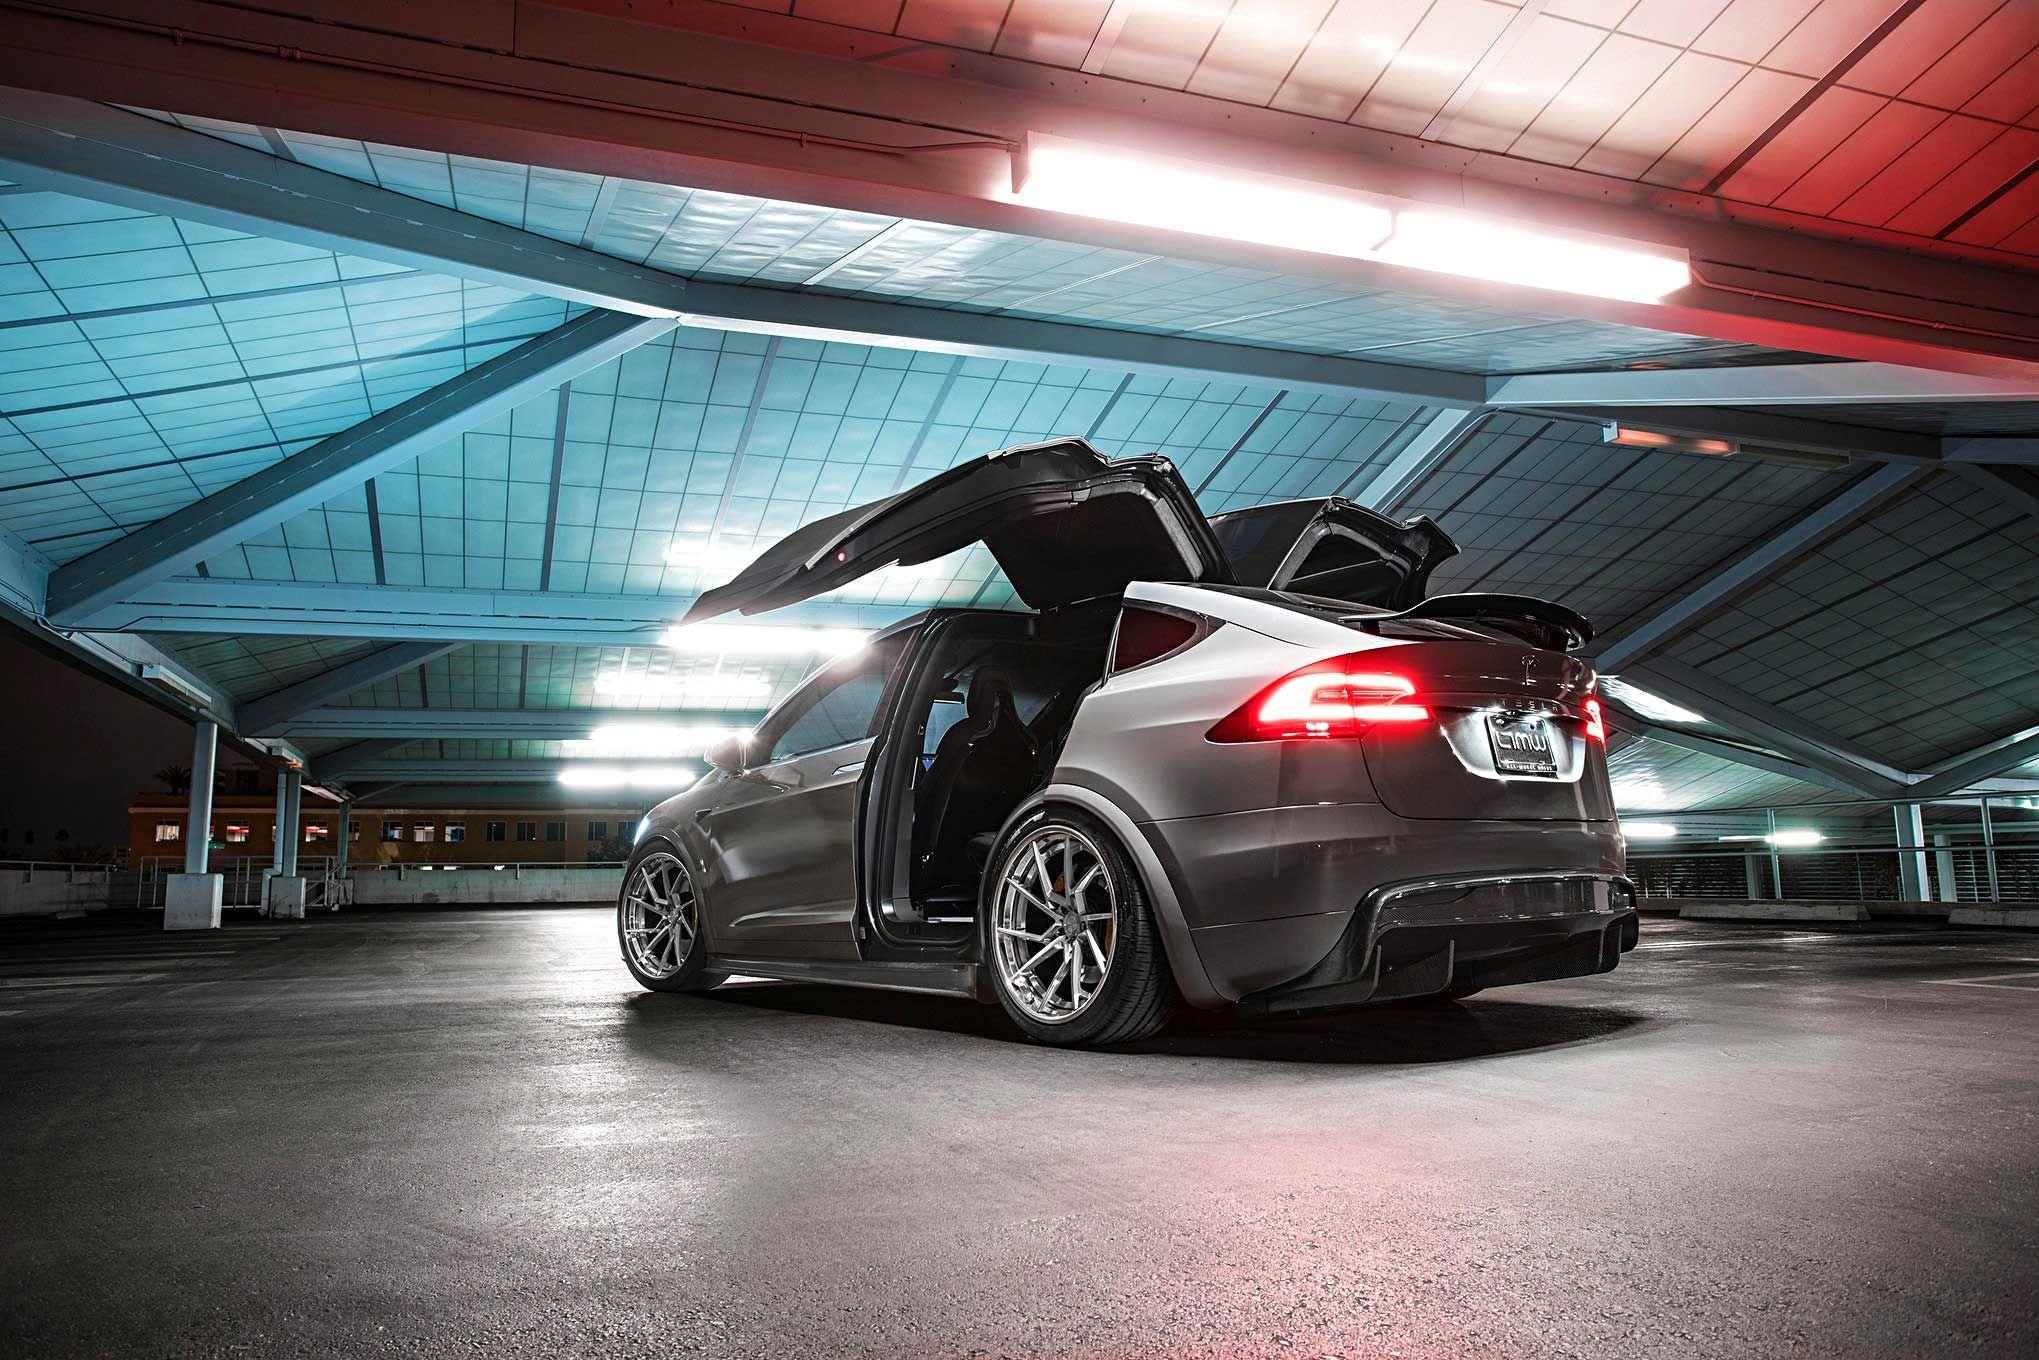 2017-tesla-model-x-p90d-revozport-bodykit 4.jpg